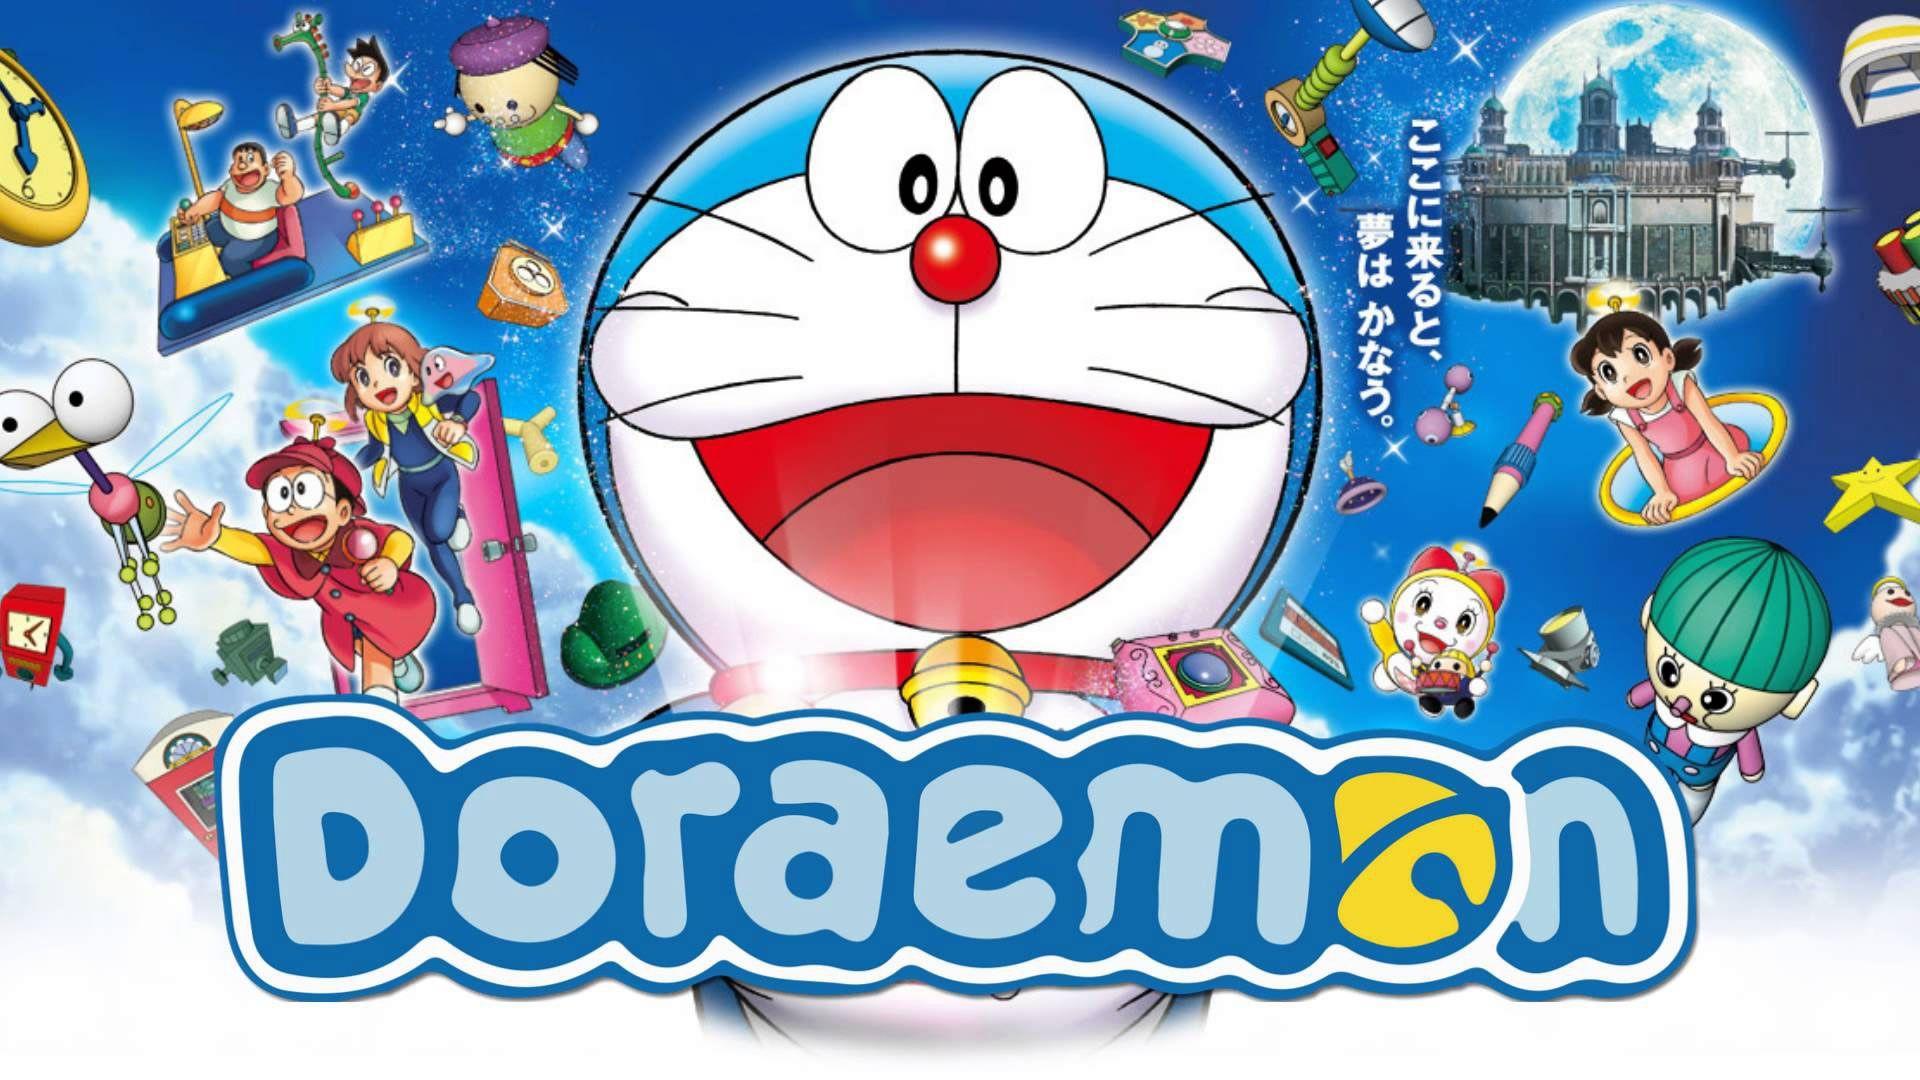 Download wallpaper doraemon free - Doraemon Wallpapers Get Free Top Quality Doraemon Wallpapers For Your Desktop Pc Background Ios